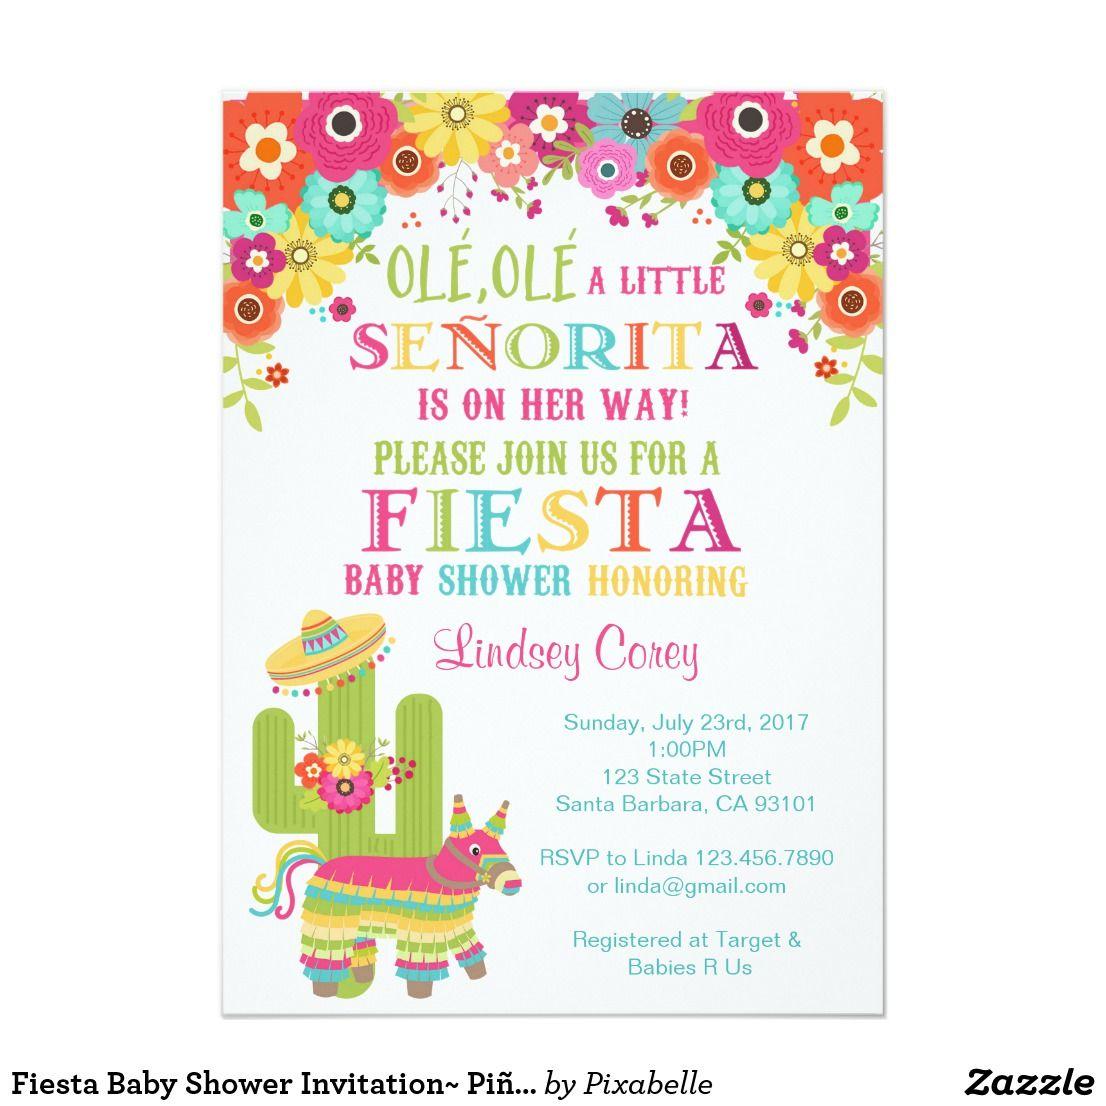 Fiesta Baby Shower Invitation~ Piñata and Flowers Card Fiesta Baby ...